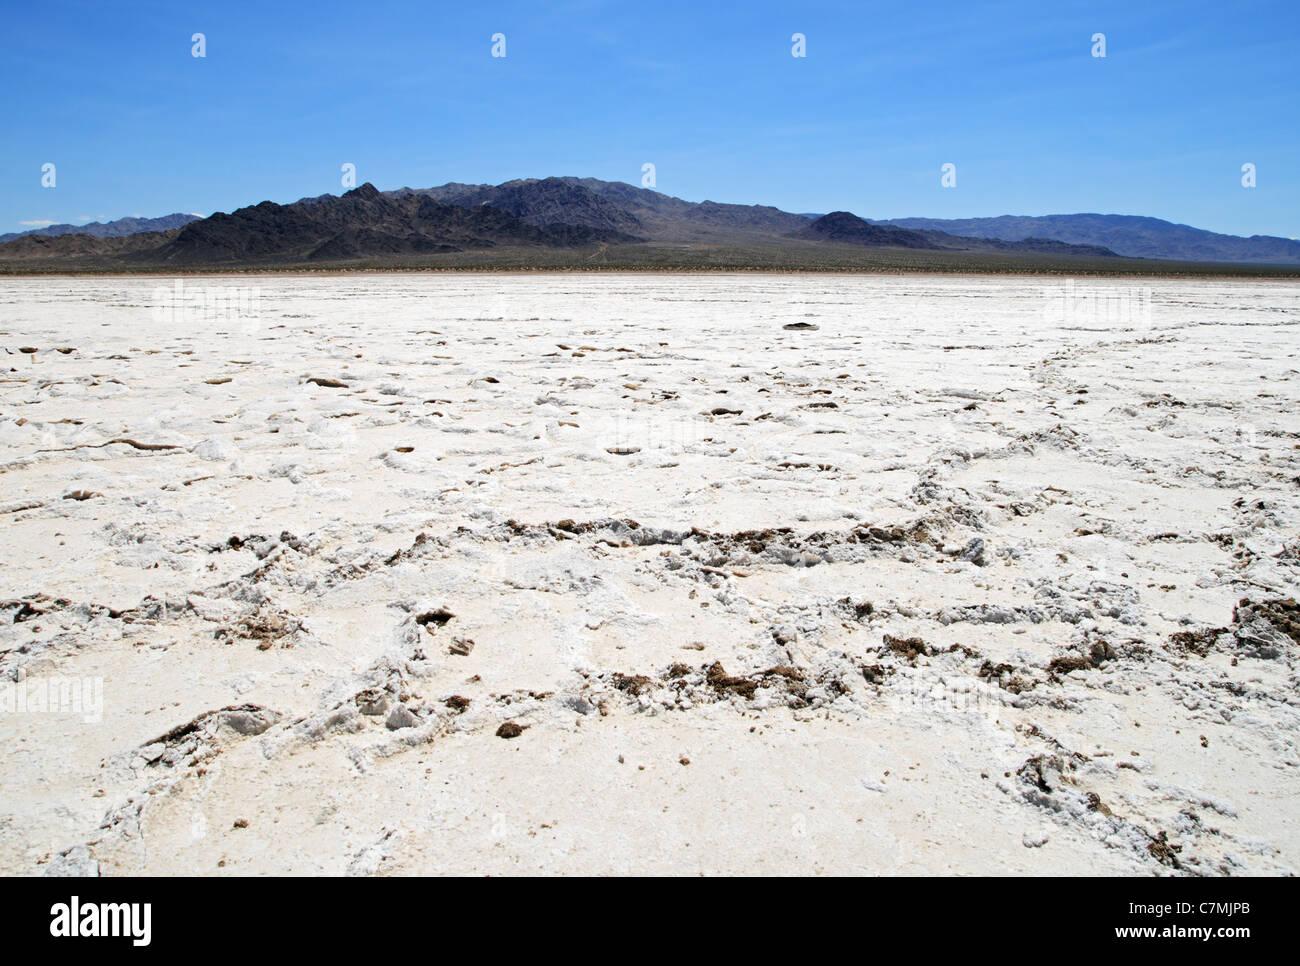 Bristol dry lake bed salt pan in the Mojave Desert of California - Stock Image